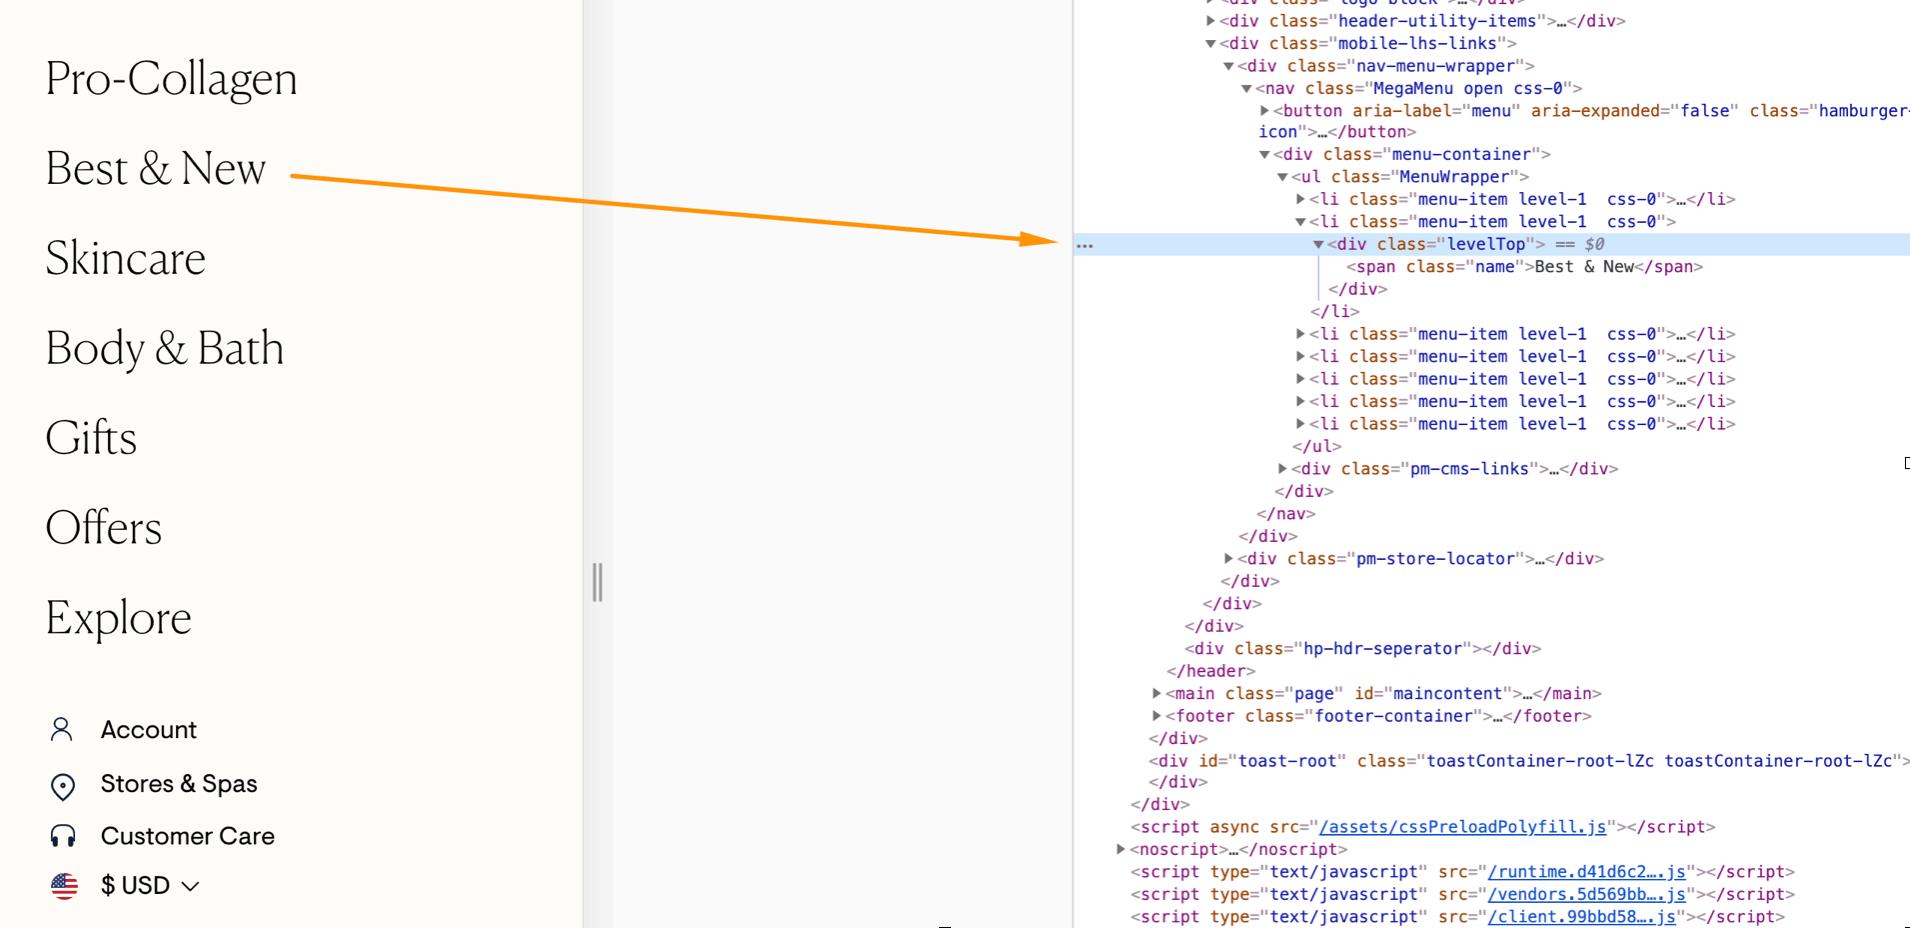 Website is not crawlable: JS SEO errors